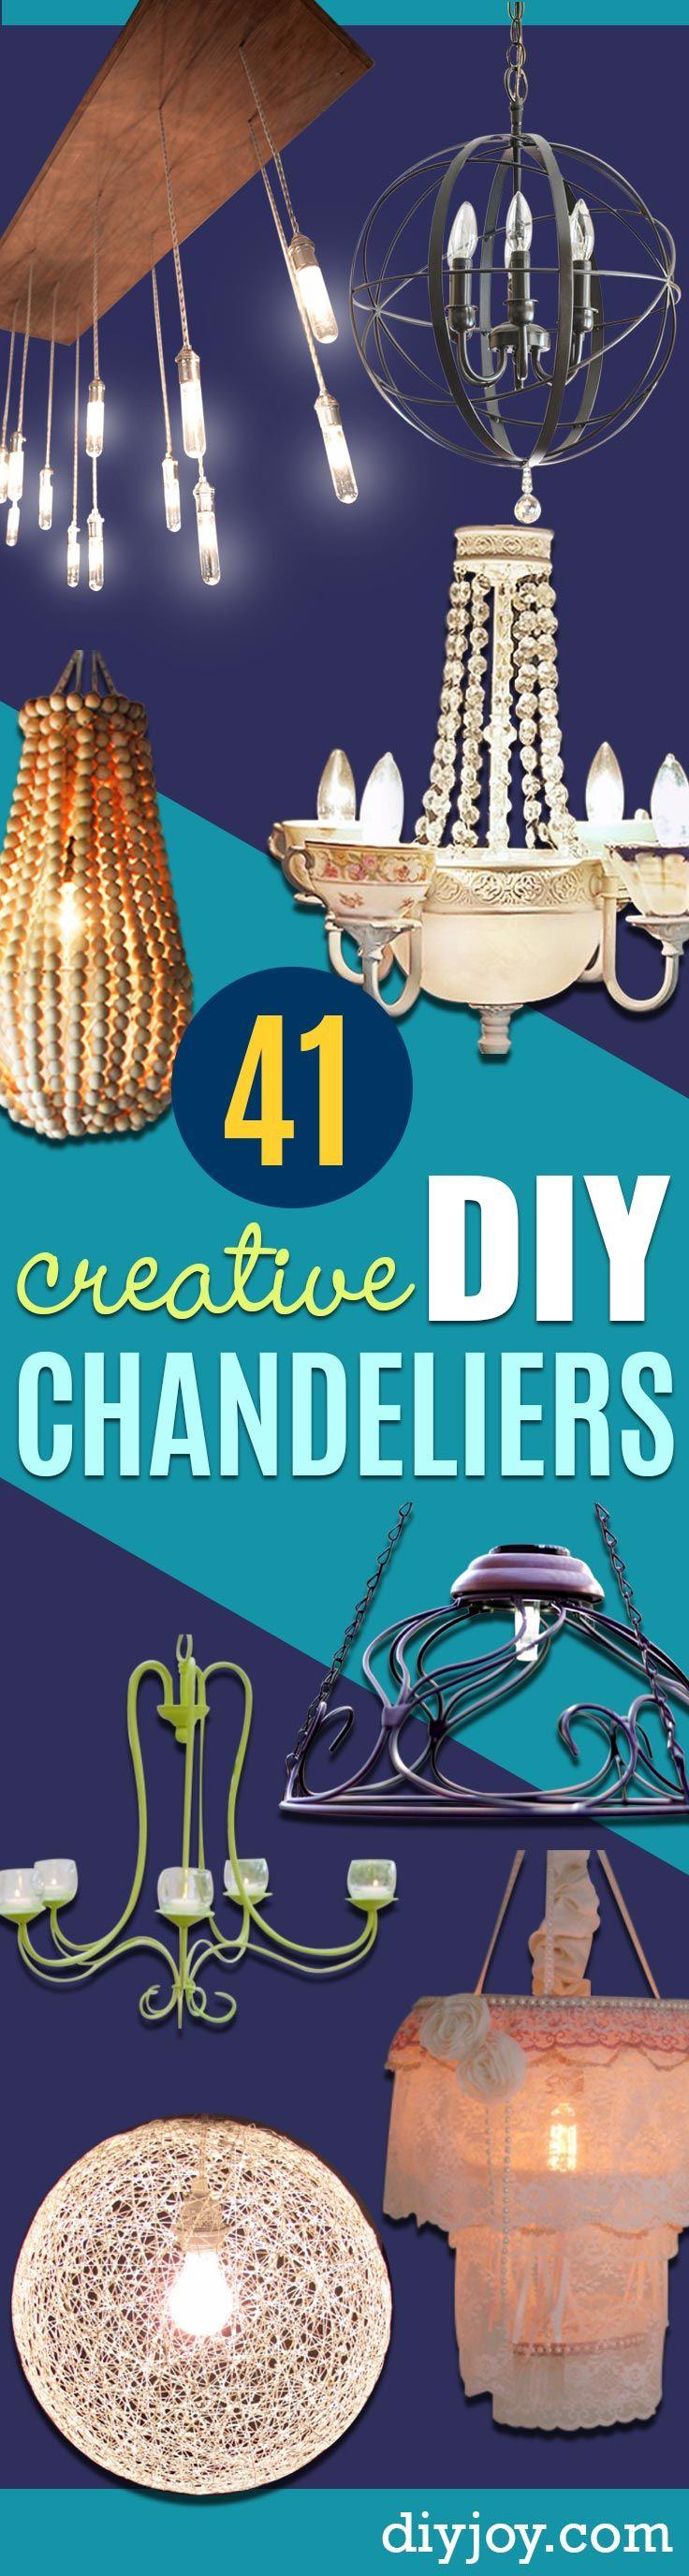 best 25+ chandelier ideas ideas only on pinterest | kitchen